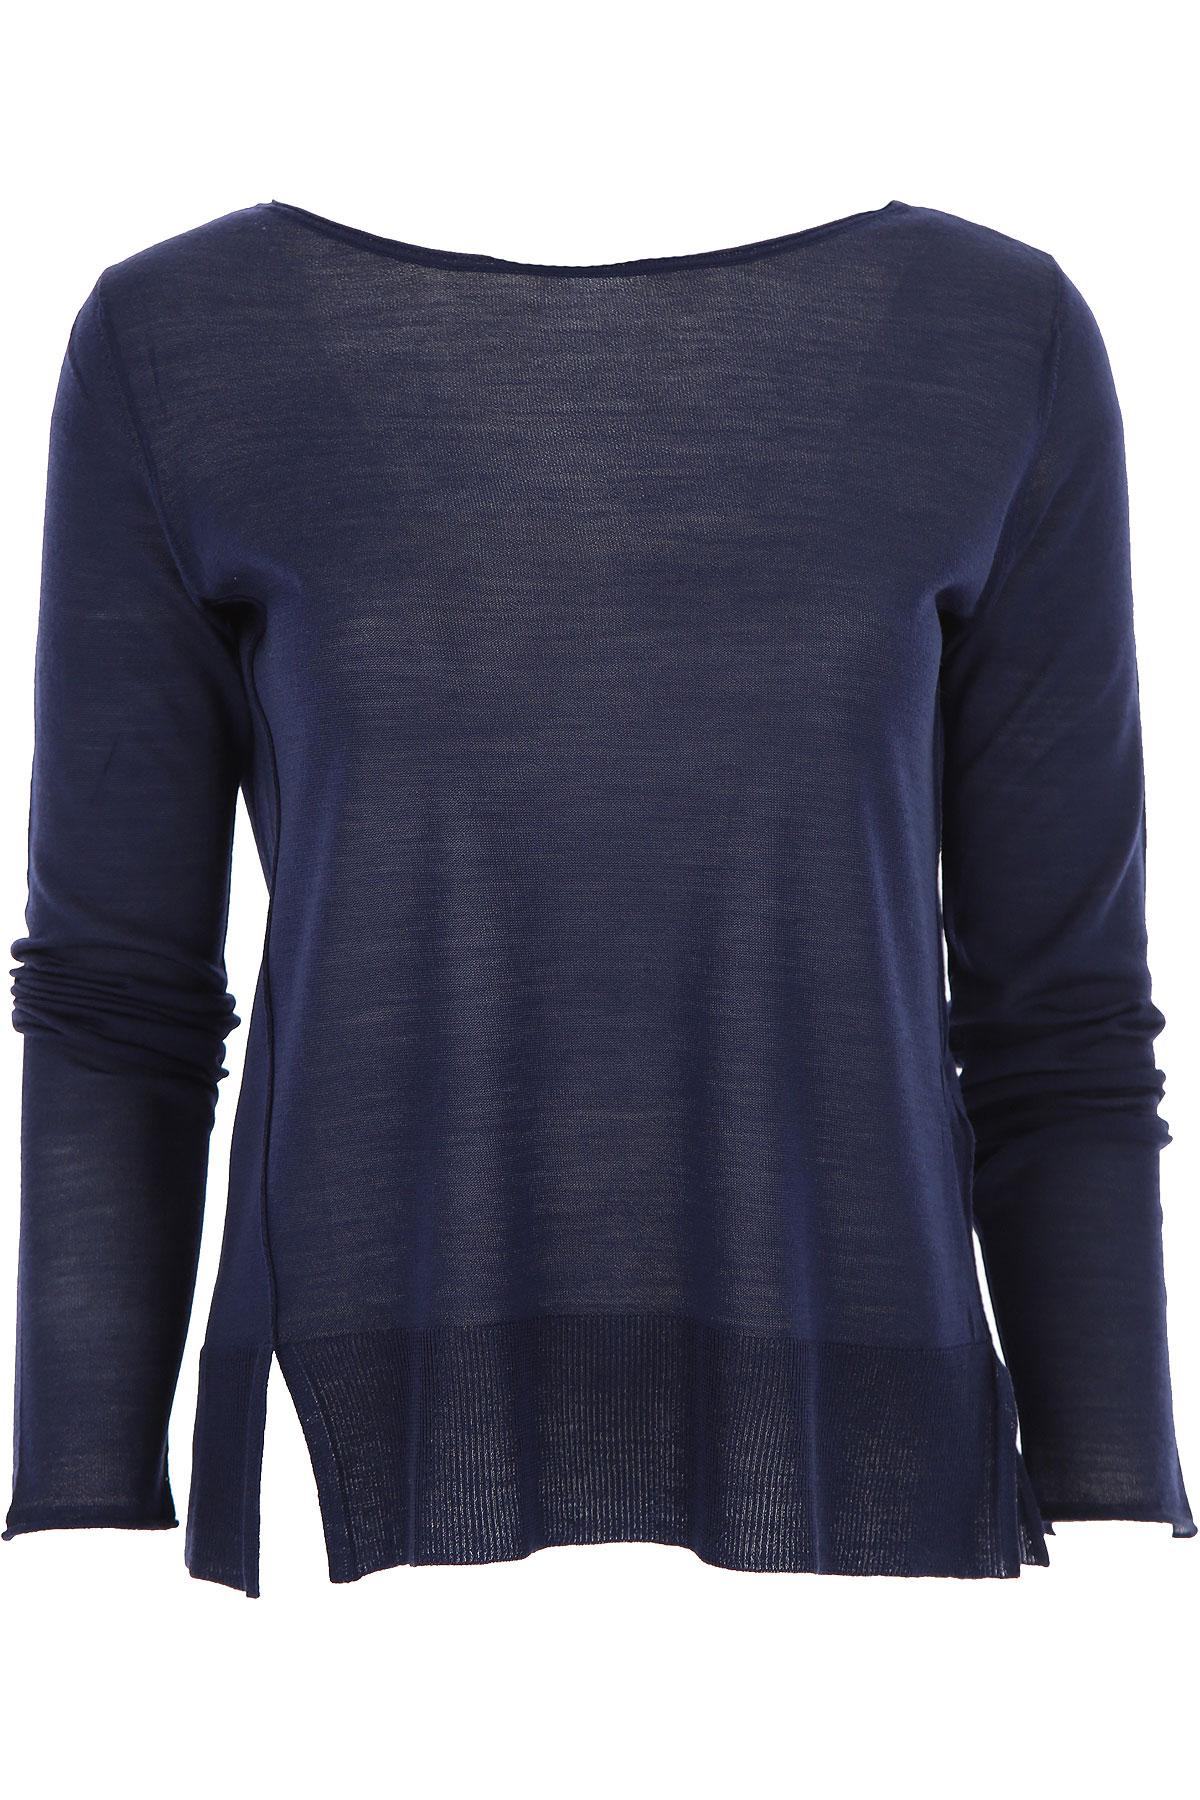 Roberto Collina Sweater for Women Jumper On Sale, Midnight Blue, Merinos Wool, 2019, 4 6 8